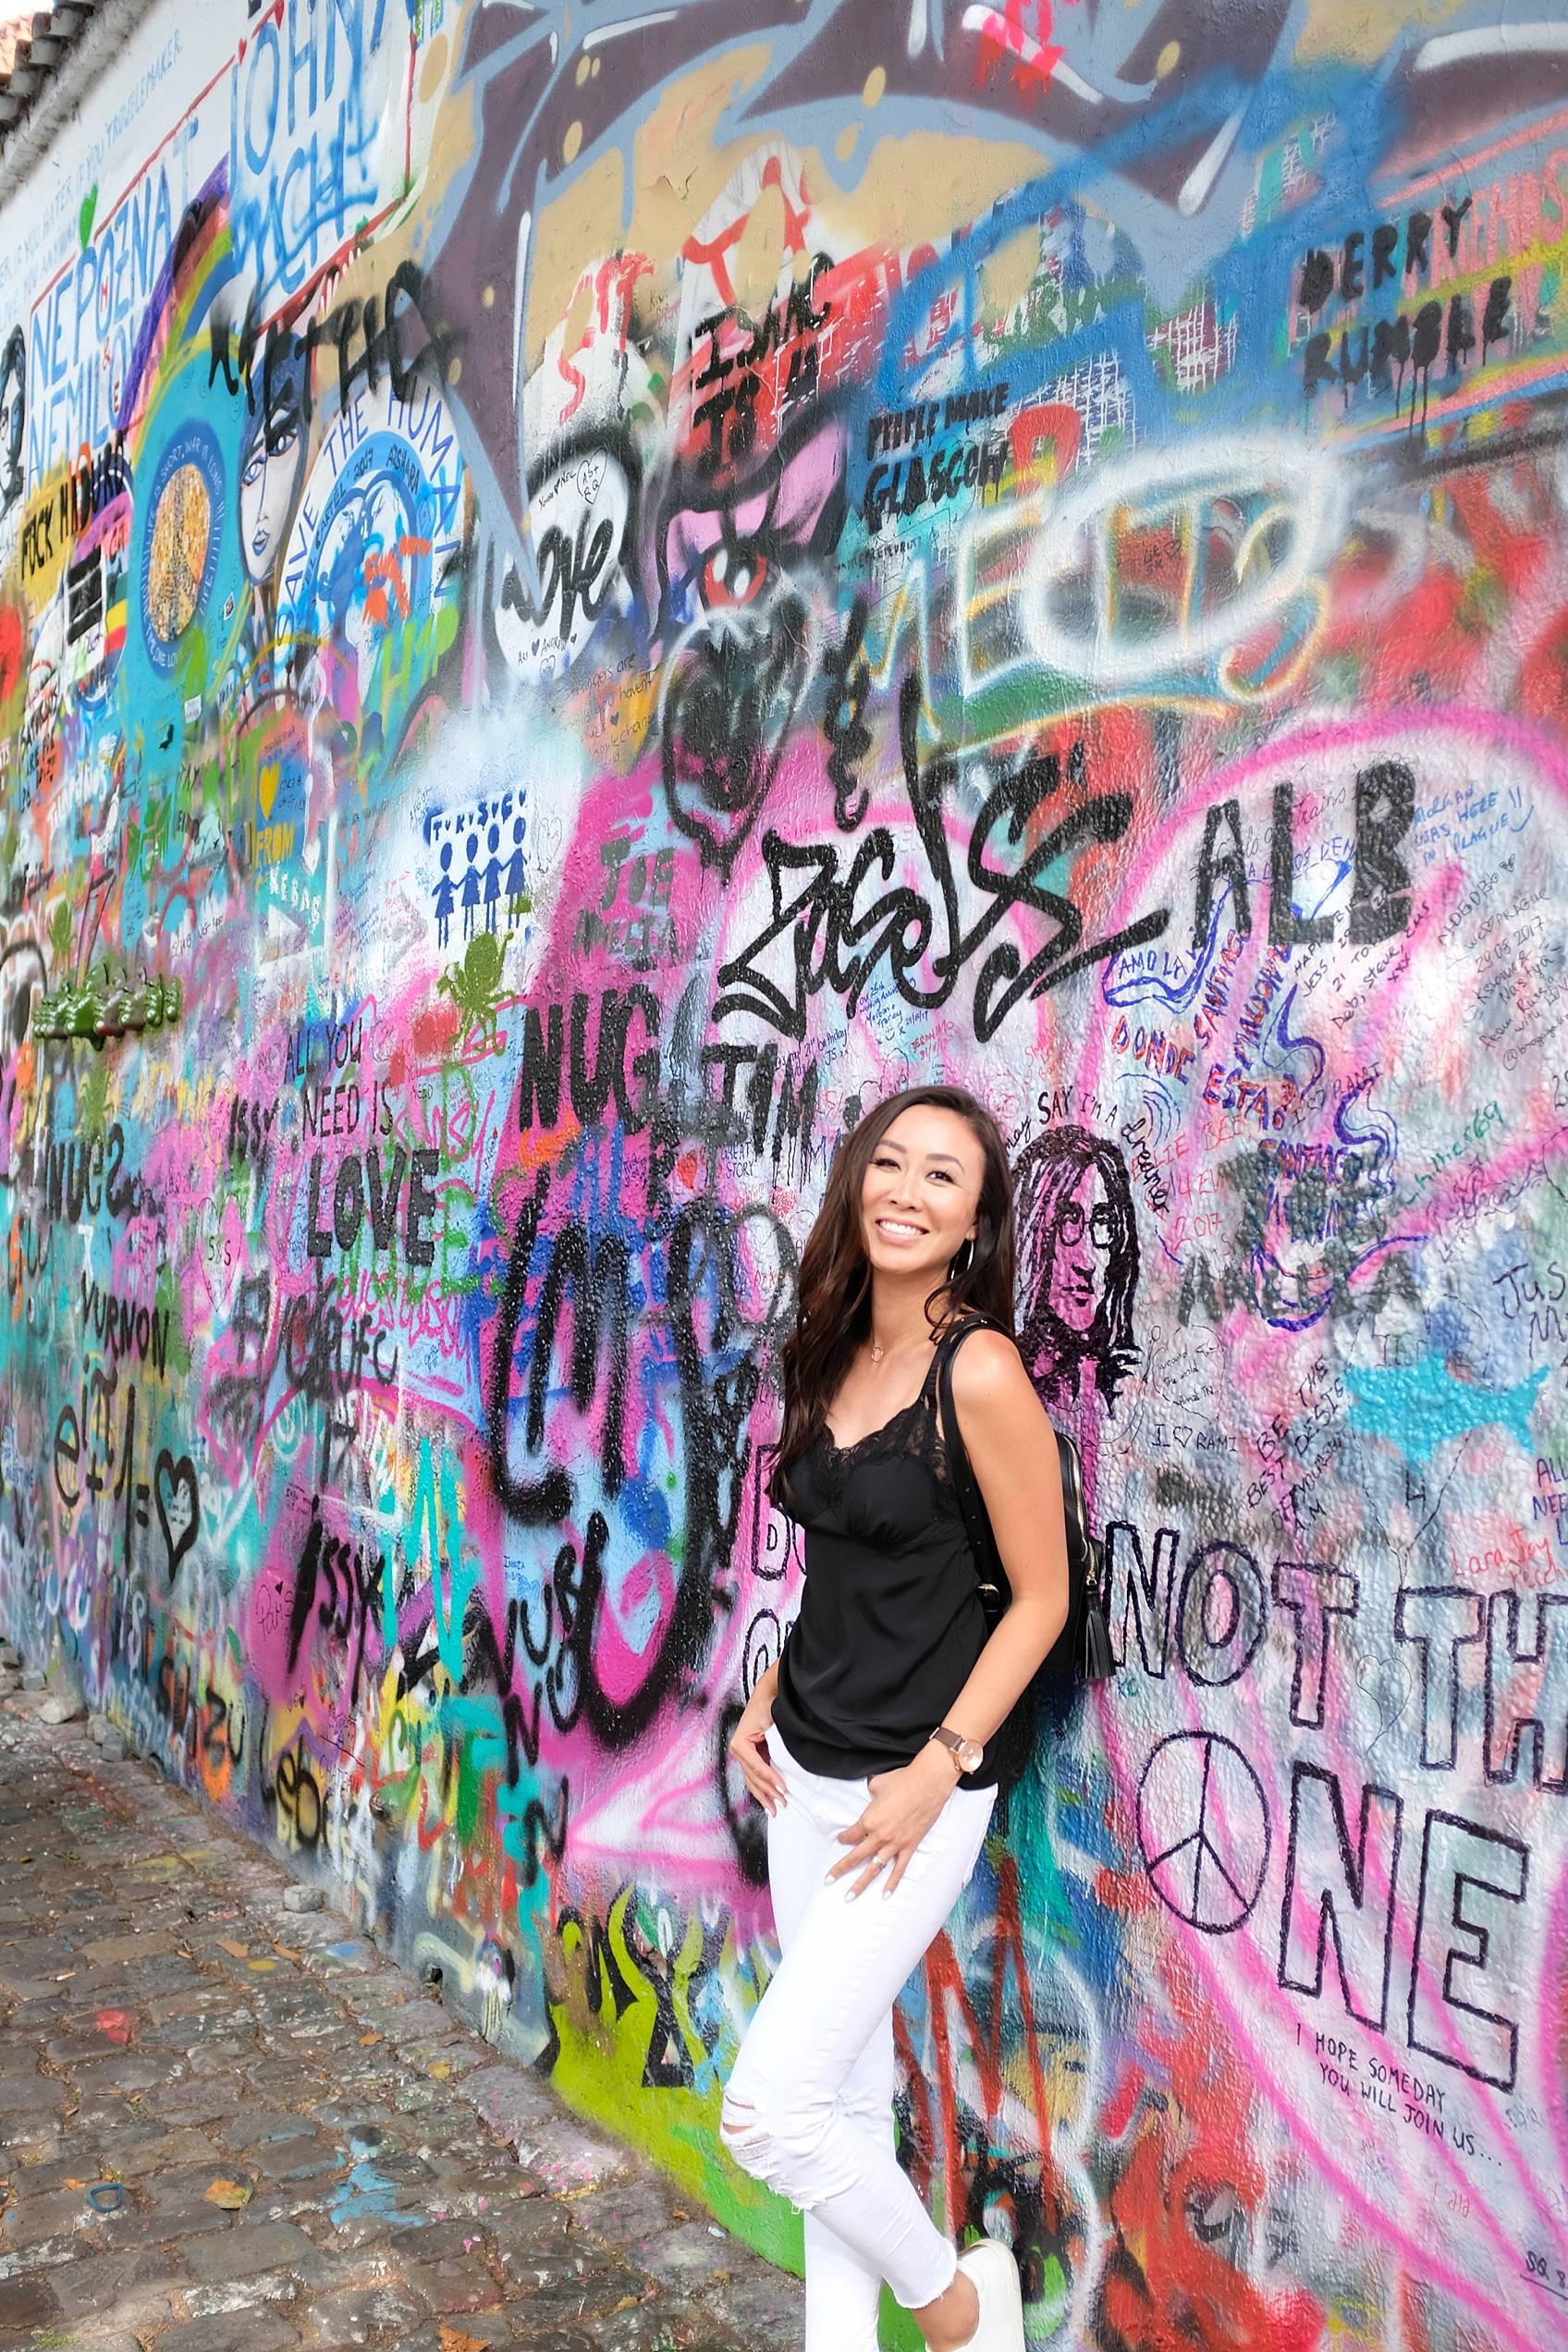 Photo guide to Prague: John Lennon graffiti wall